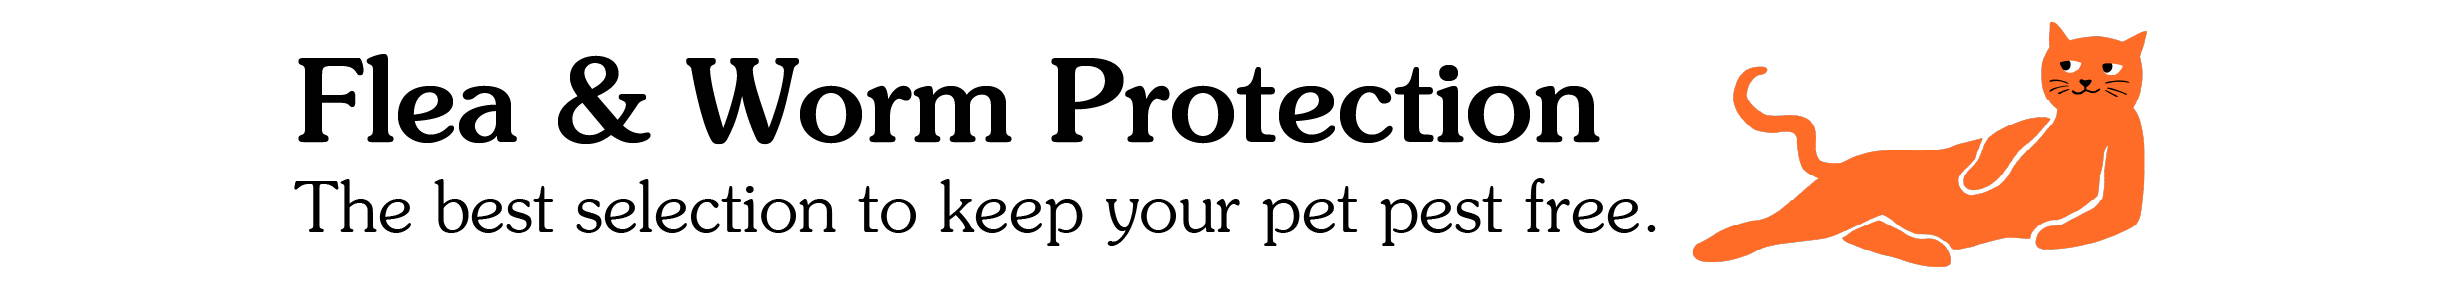 Flea & Worm Protection